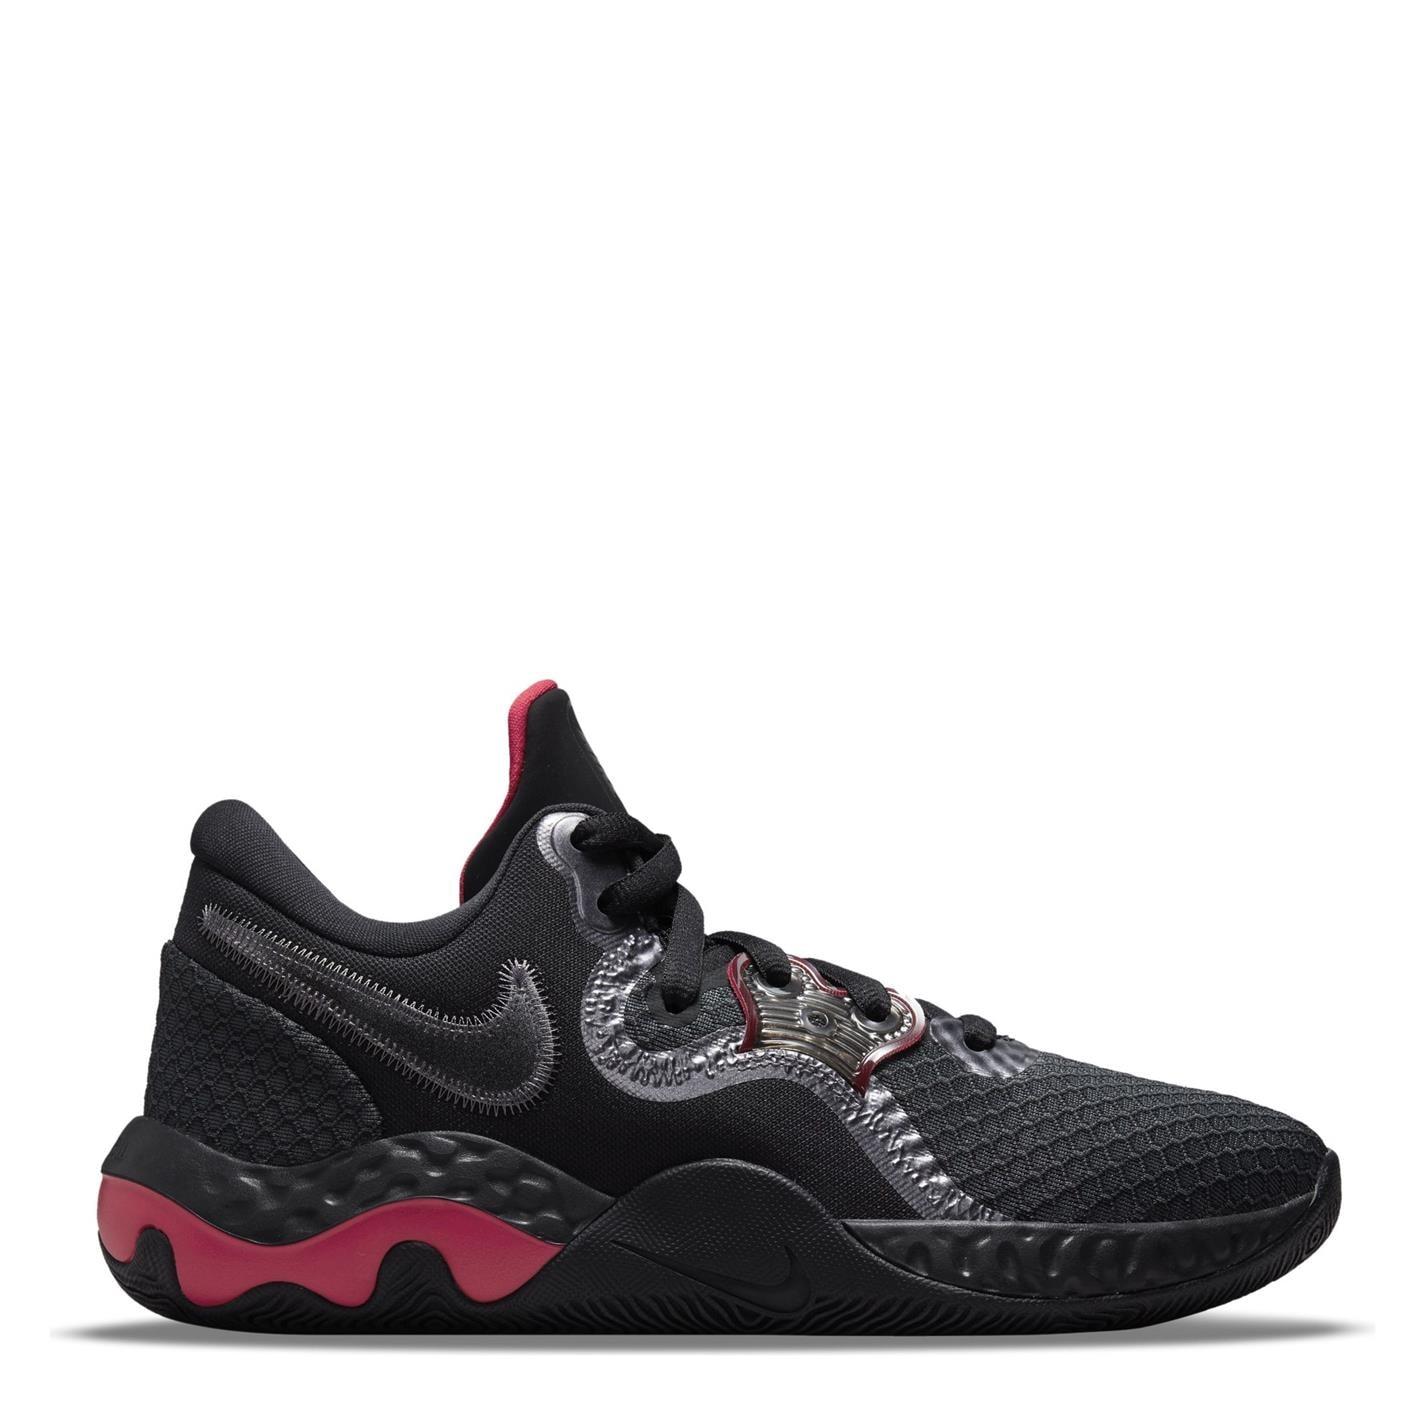 Nike Renew Elevate 2 baschet Shoe gri negru rosu